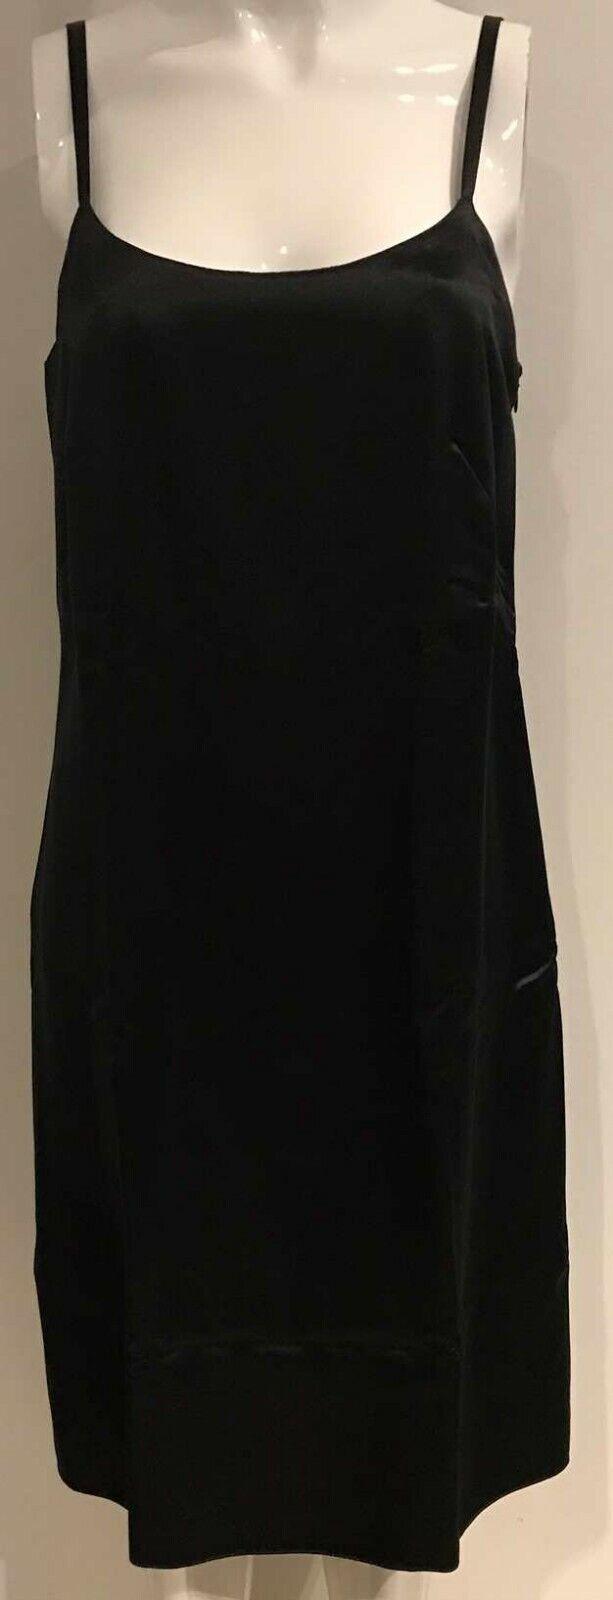 Italian Designer Mariella Burani schwarz short summer dress IT 44 Vintage NWOT